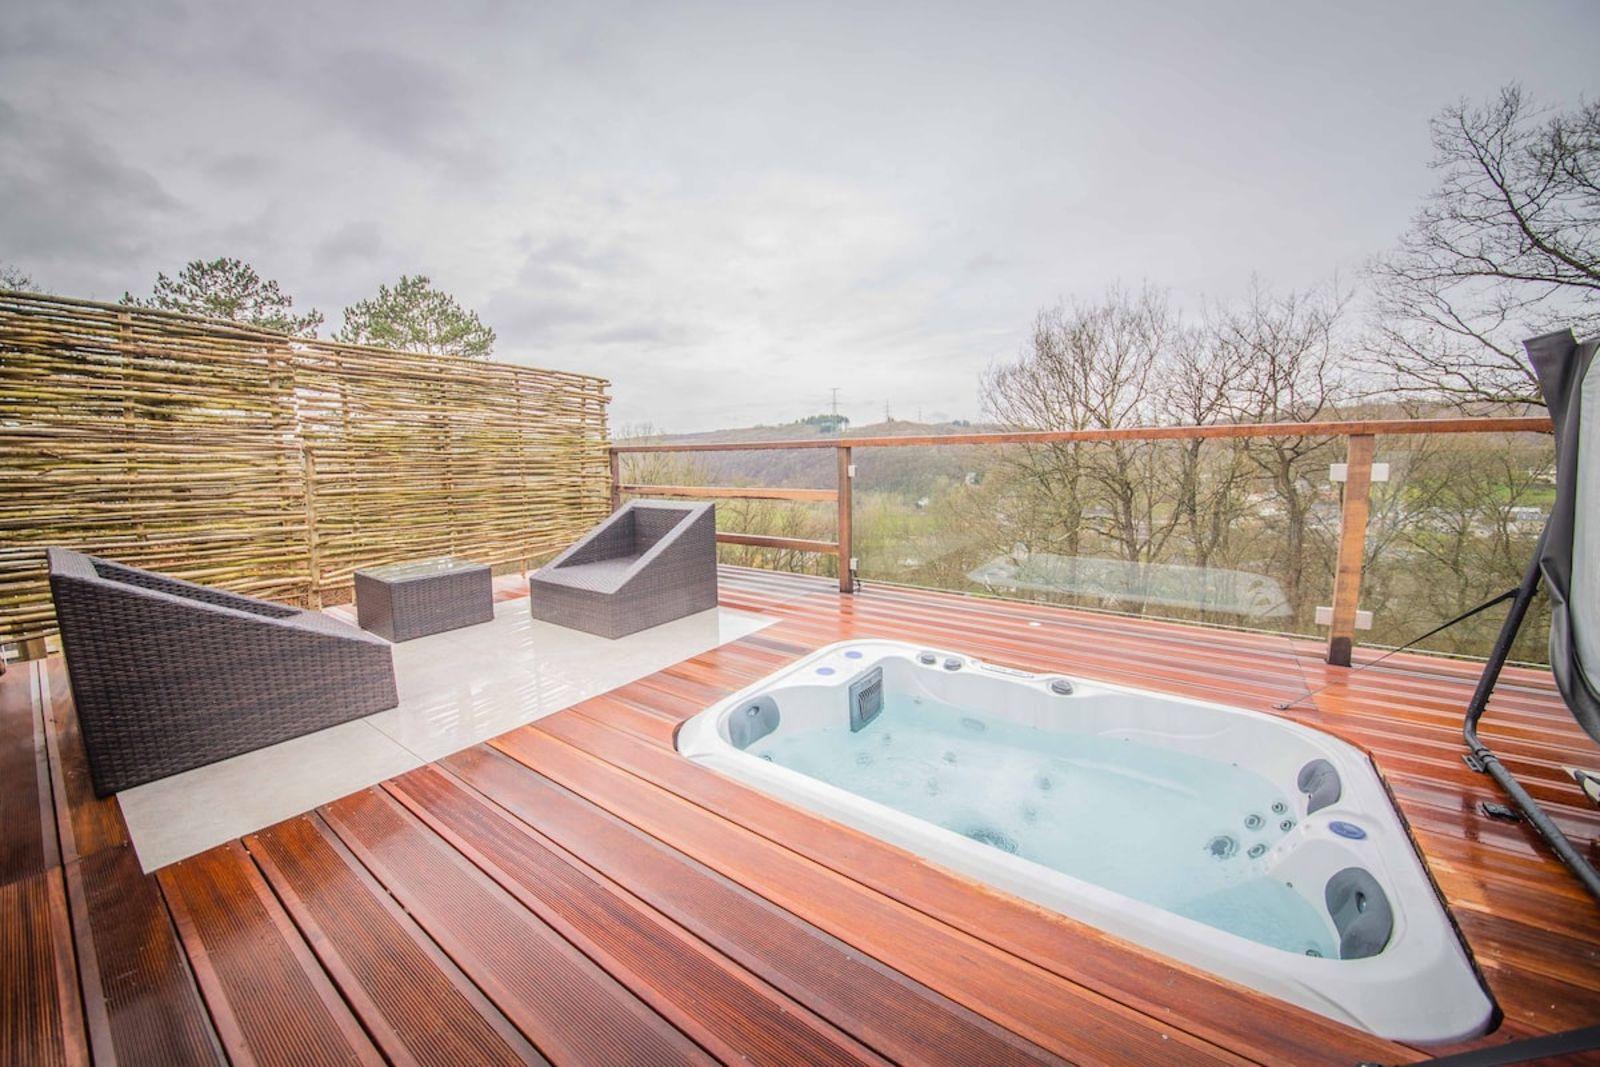 Airbnb oak fruit, Partner, airbnb